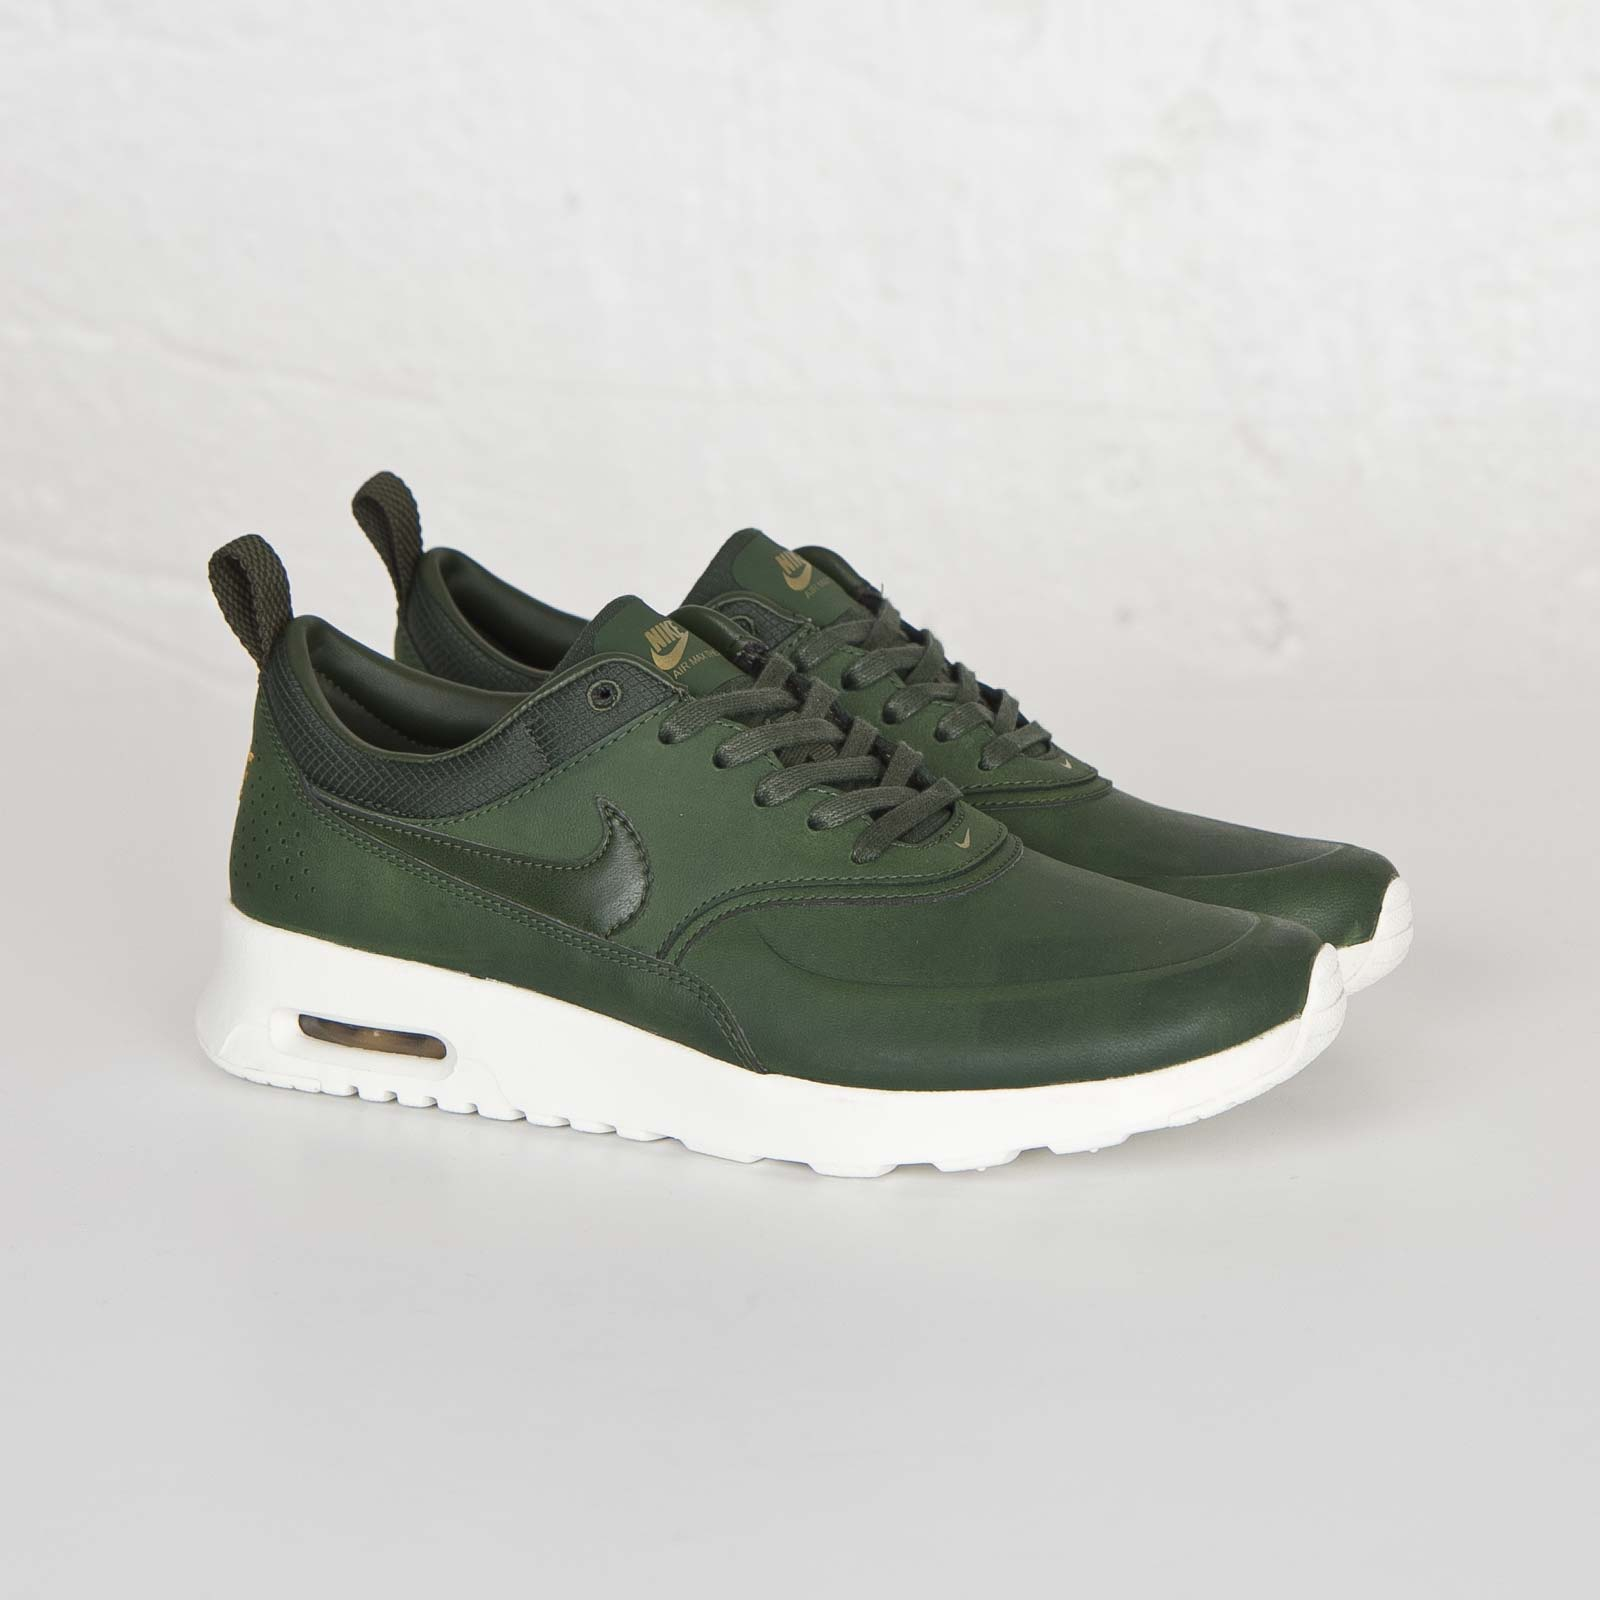 Wmns 304 Nike Air Premium 616723 Sneakersnstuff Thea Max eWD9IEY2H